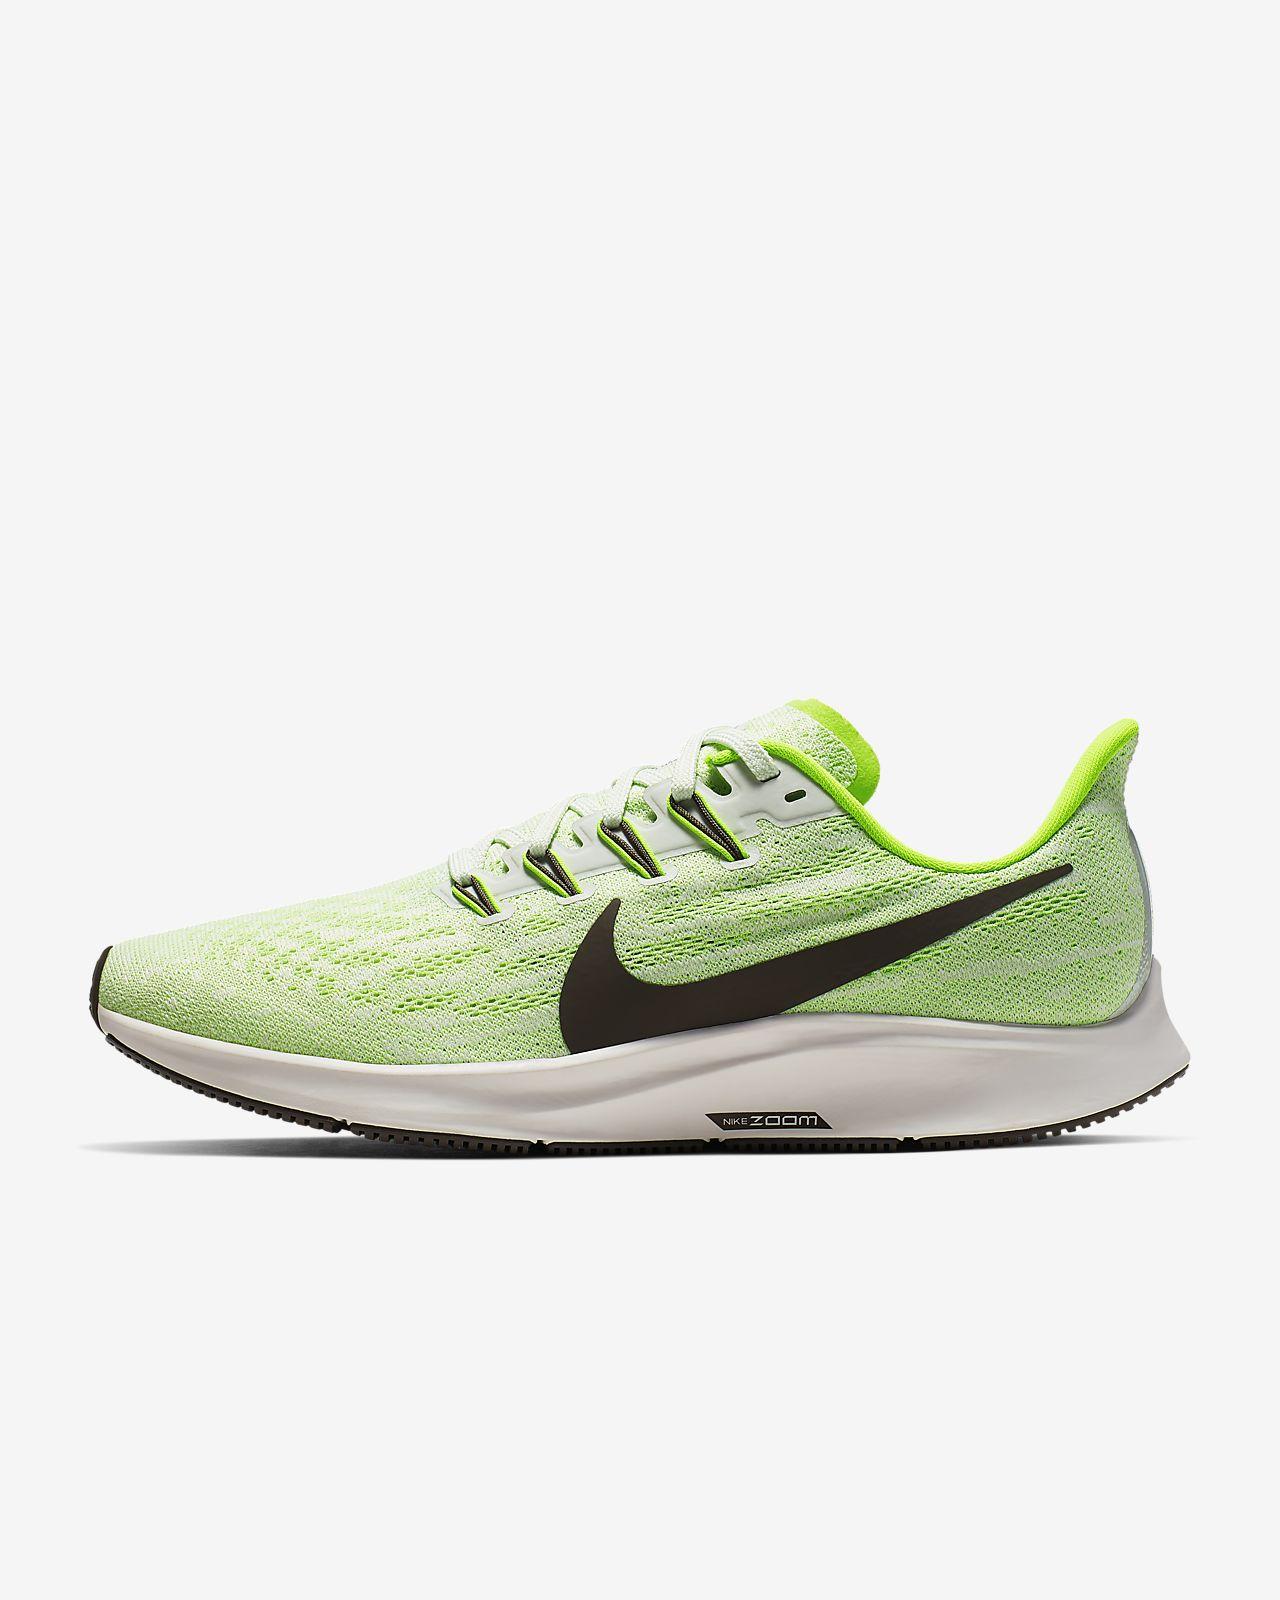 0ee827fe Мужские беговые кроссовки Nike Air Zoom Pegasus 36. Nike.com RU